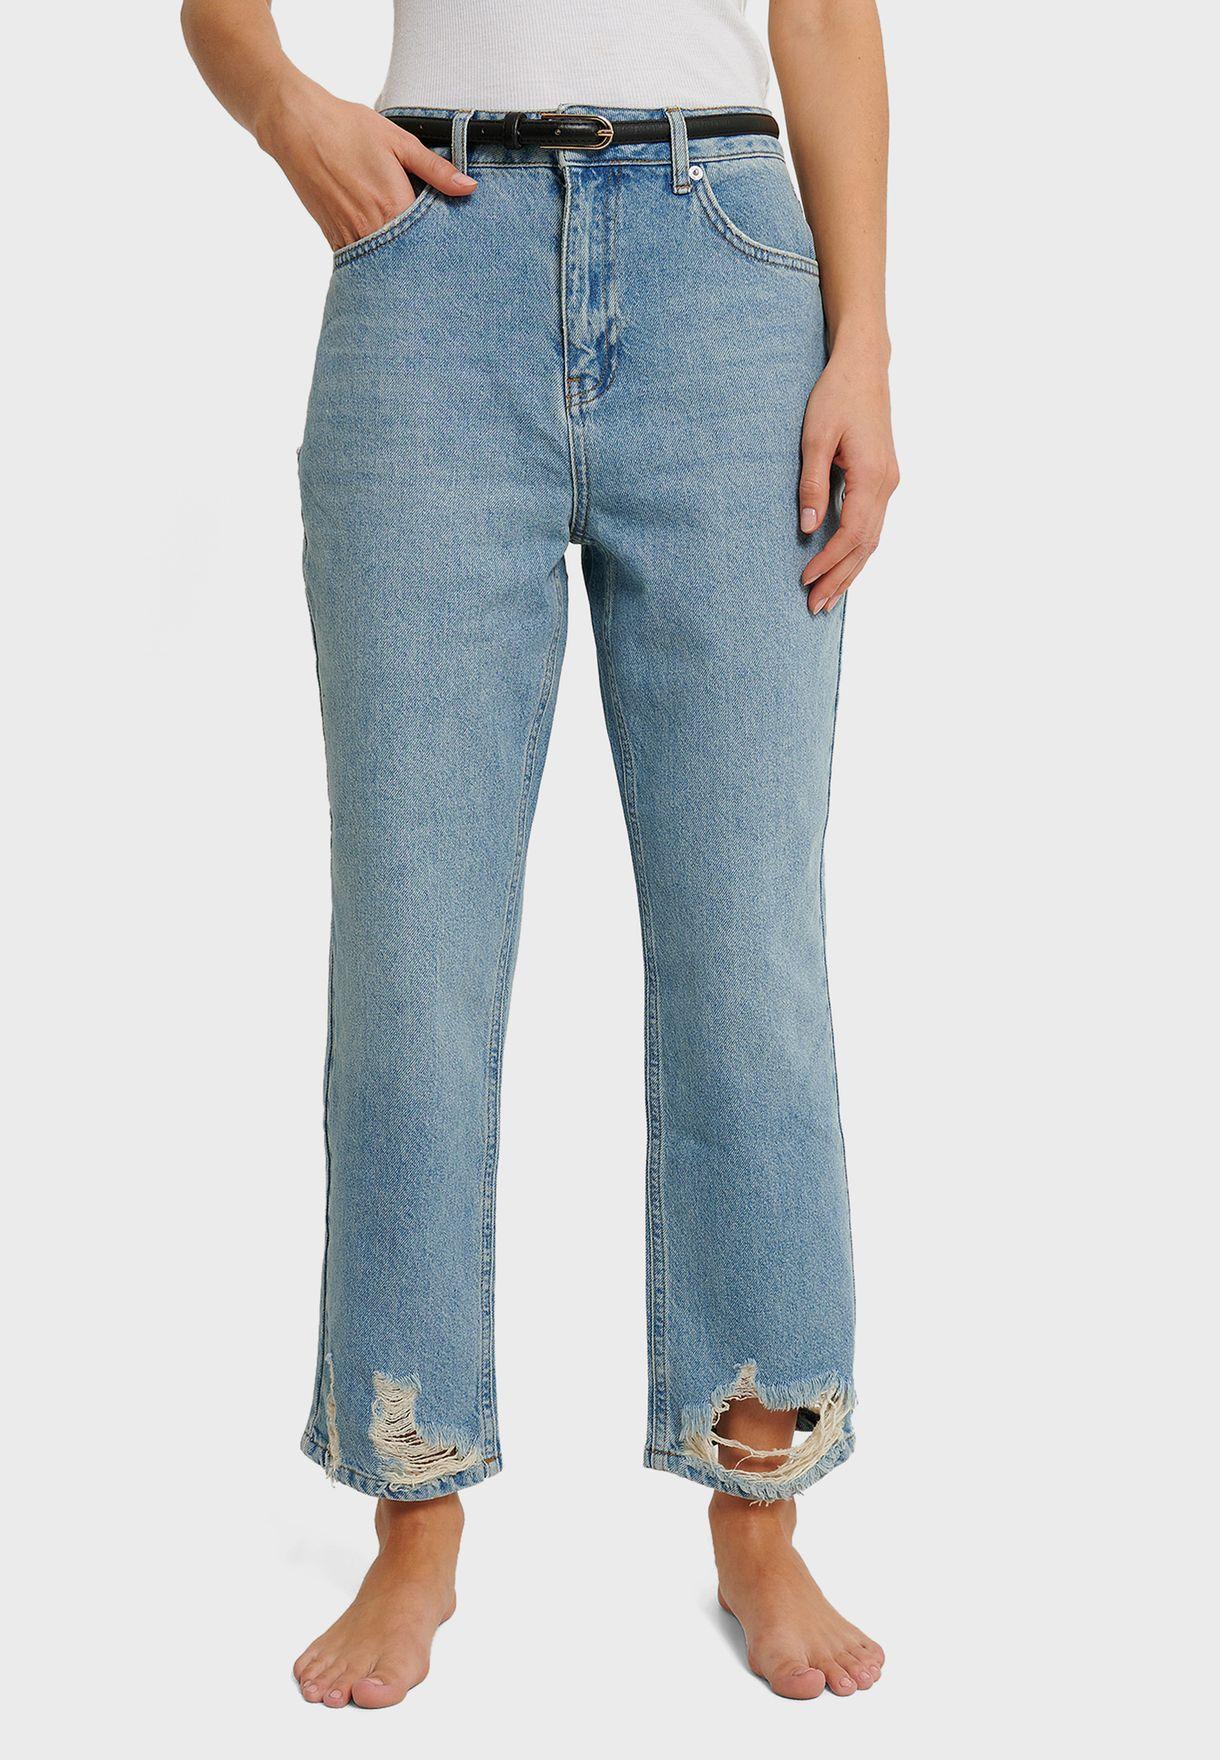 جينز بخصر عالي وشقوق